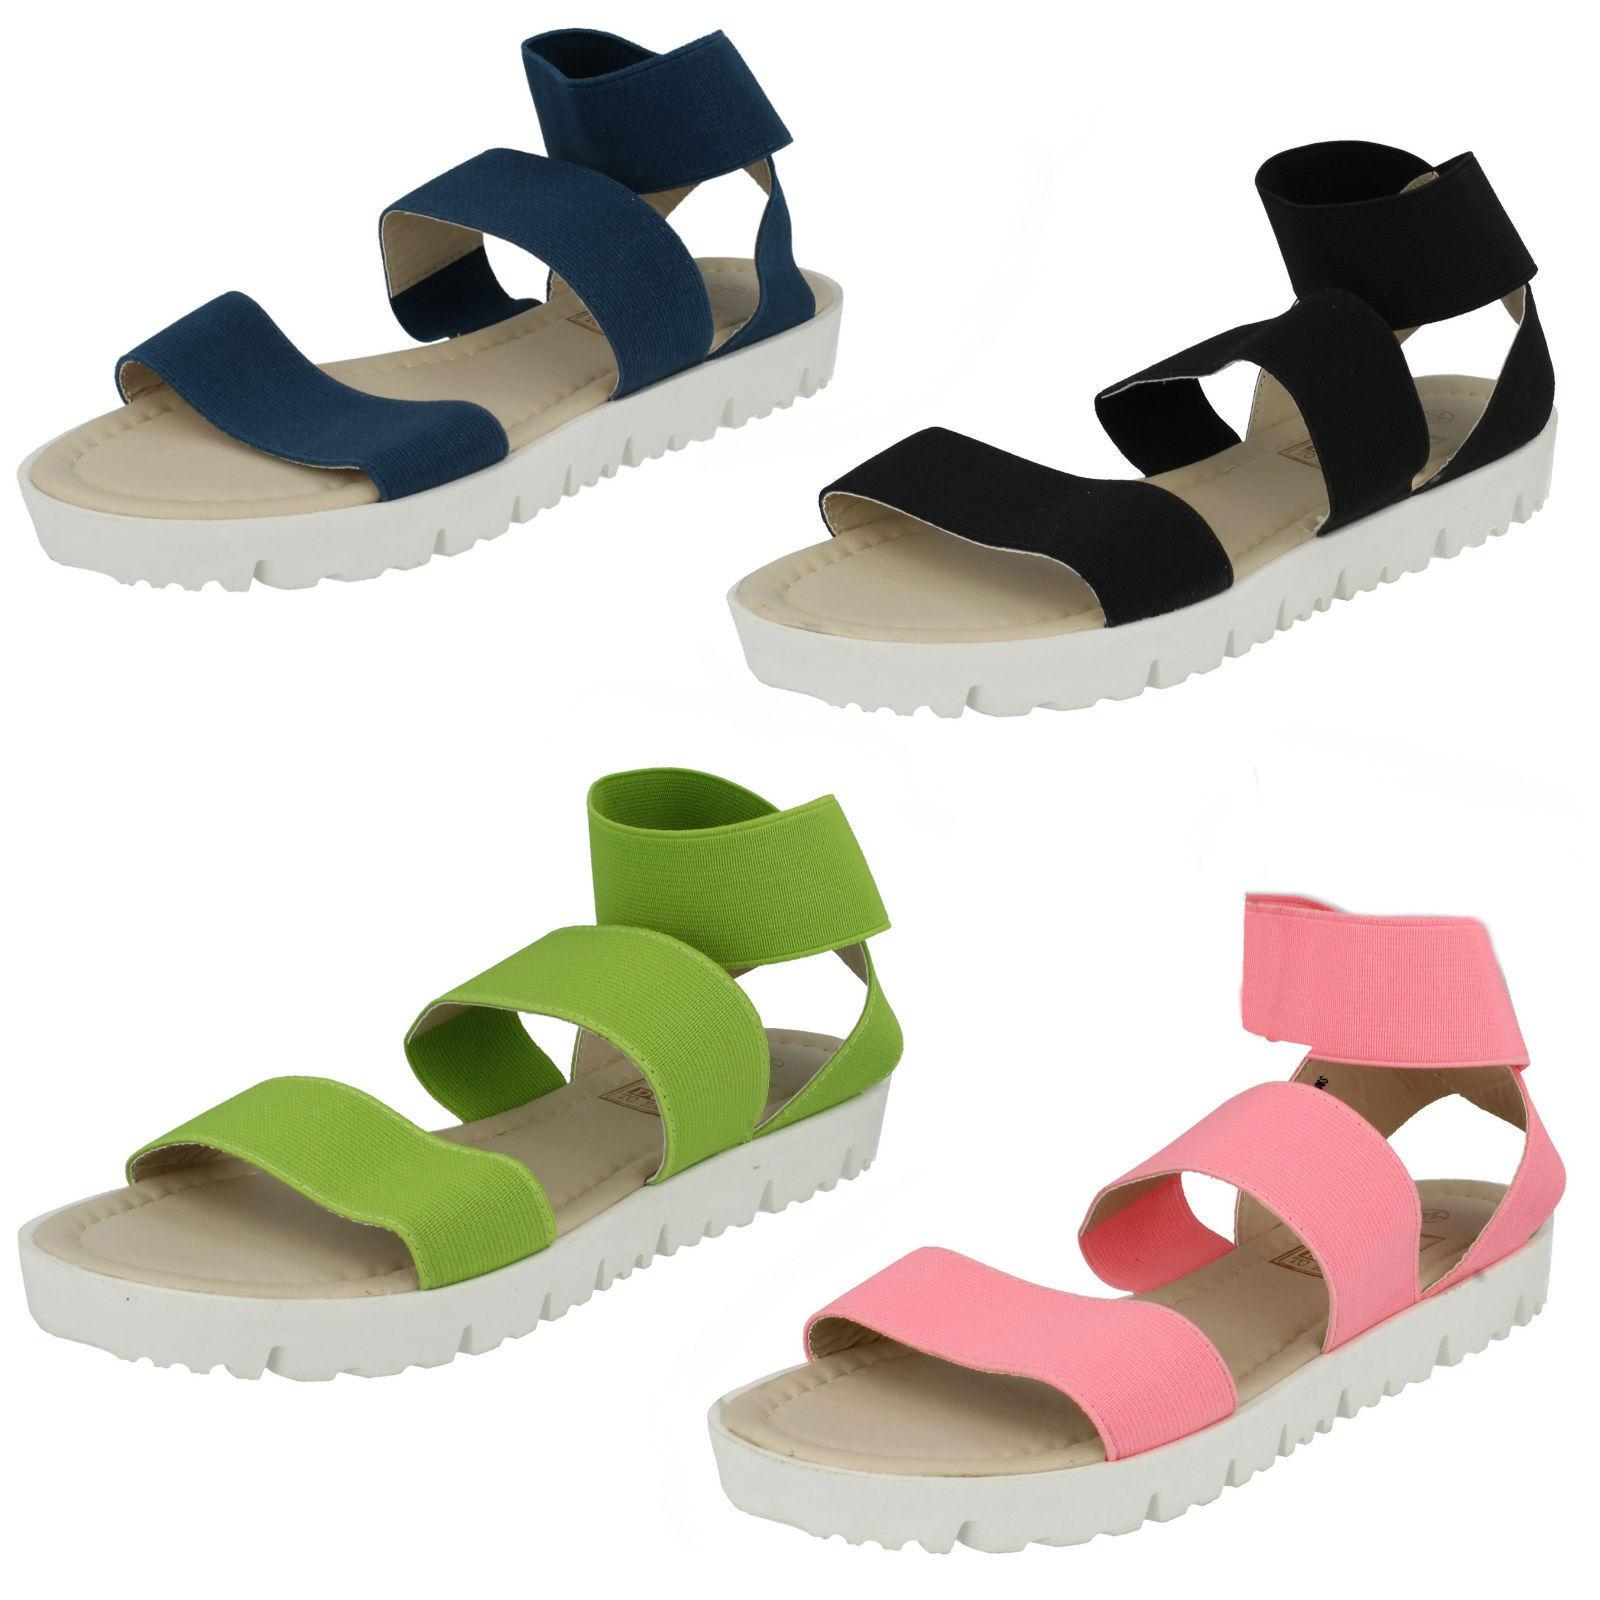 SALE sandals NOW Ladies Down to earth elastic sandals SALE 4 colours available F10406 61e98c